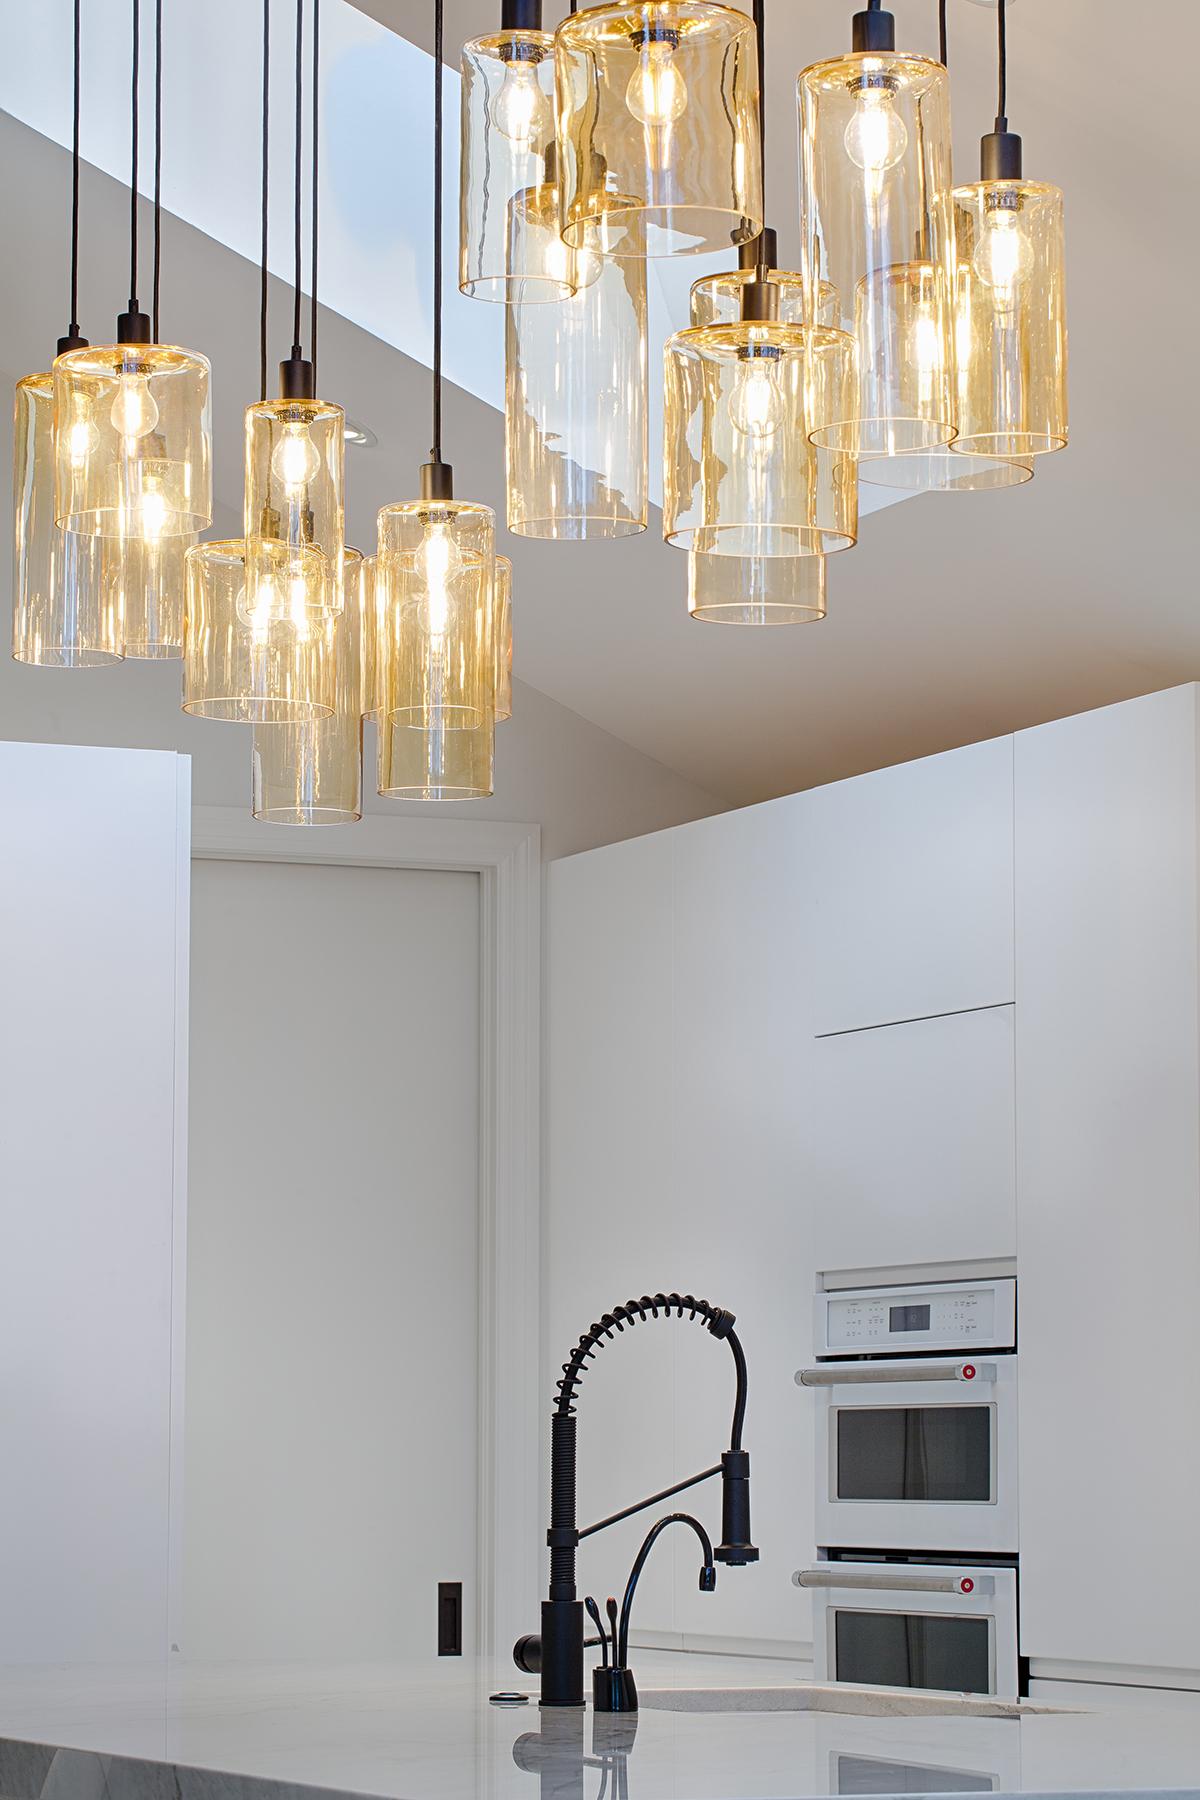 Contemporary Interior Design in West Boca Raton, Fl, Rooms by Eve, Eve Joss6.jpg